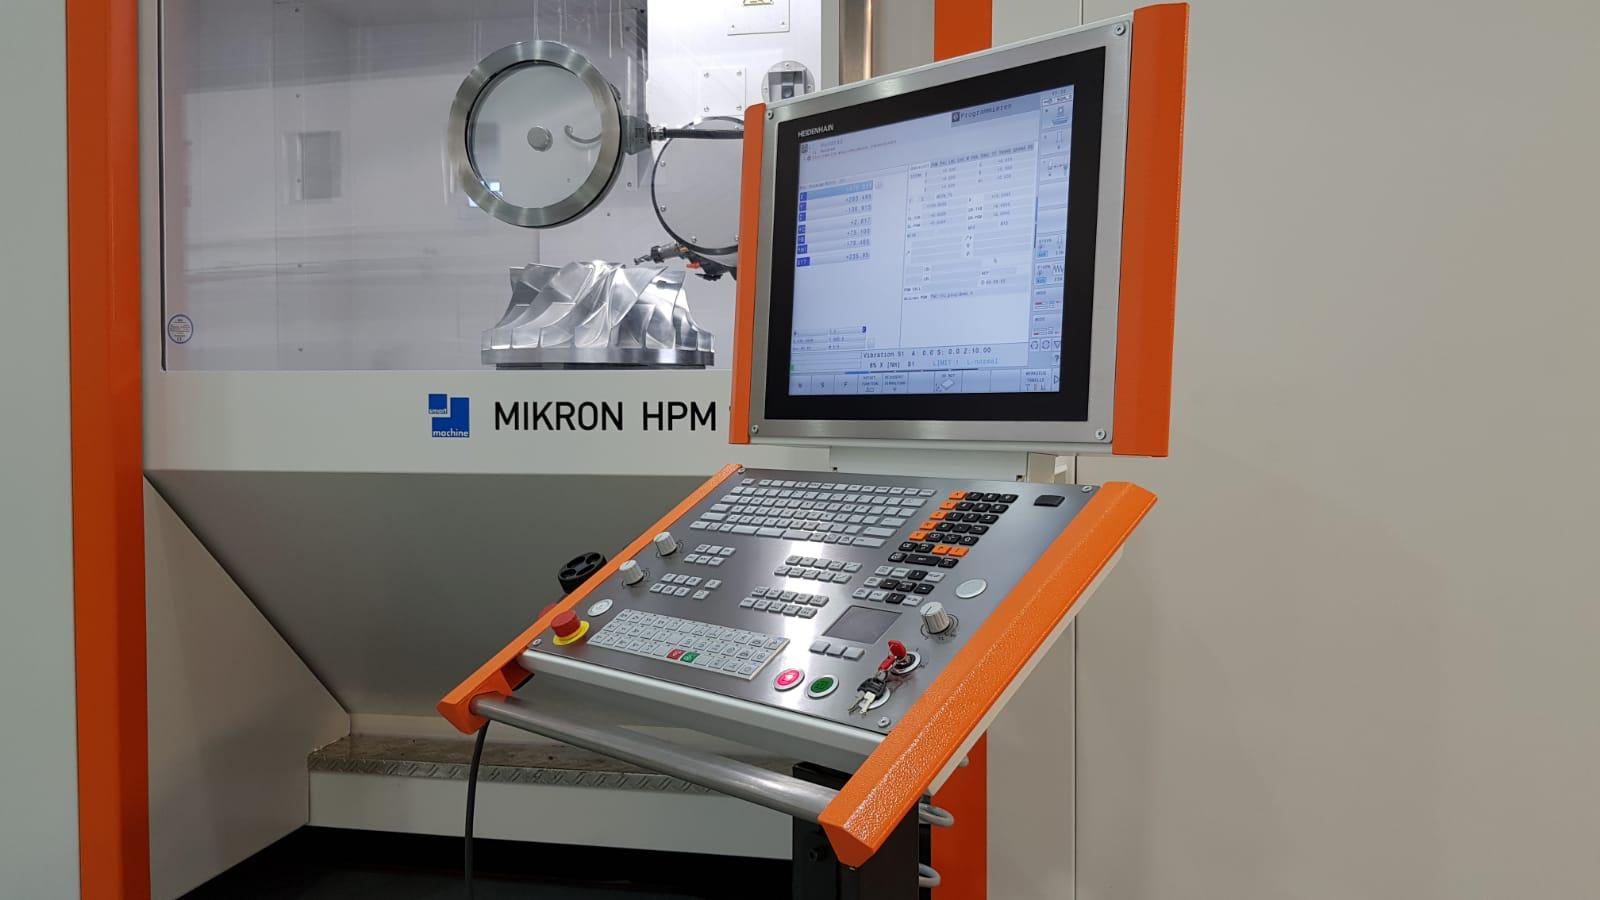 High Performance Milling - HPM / High Performance Milling - HPM / Высокоскоростное фрезерование - HPM